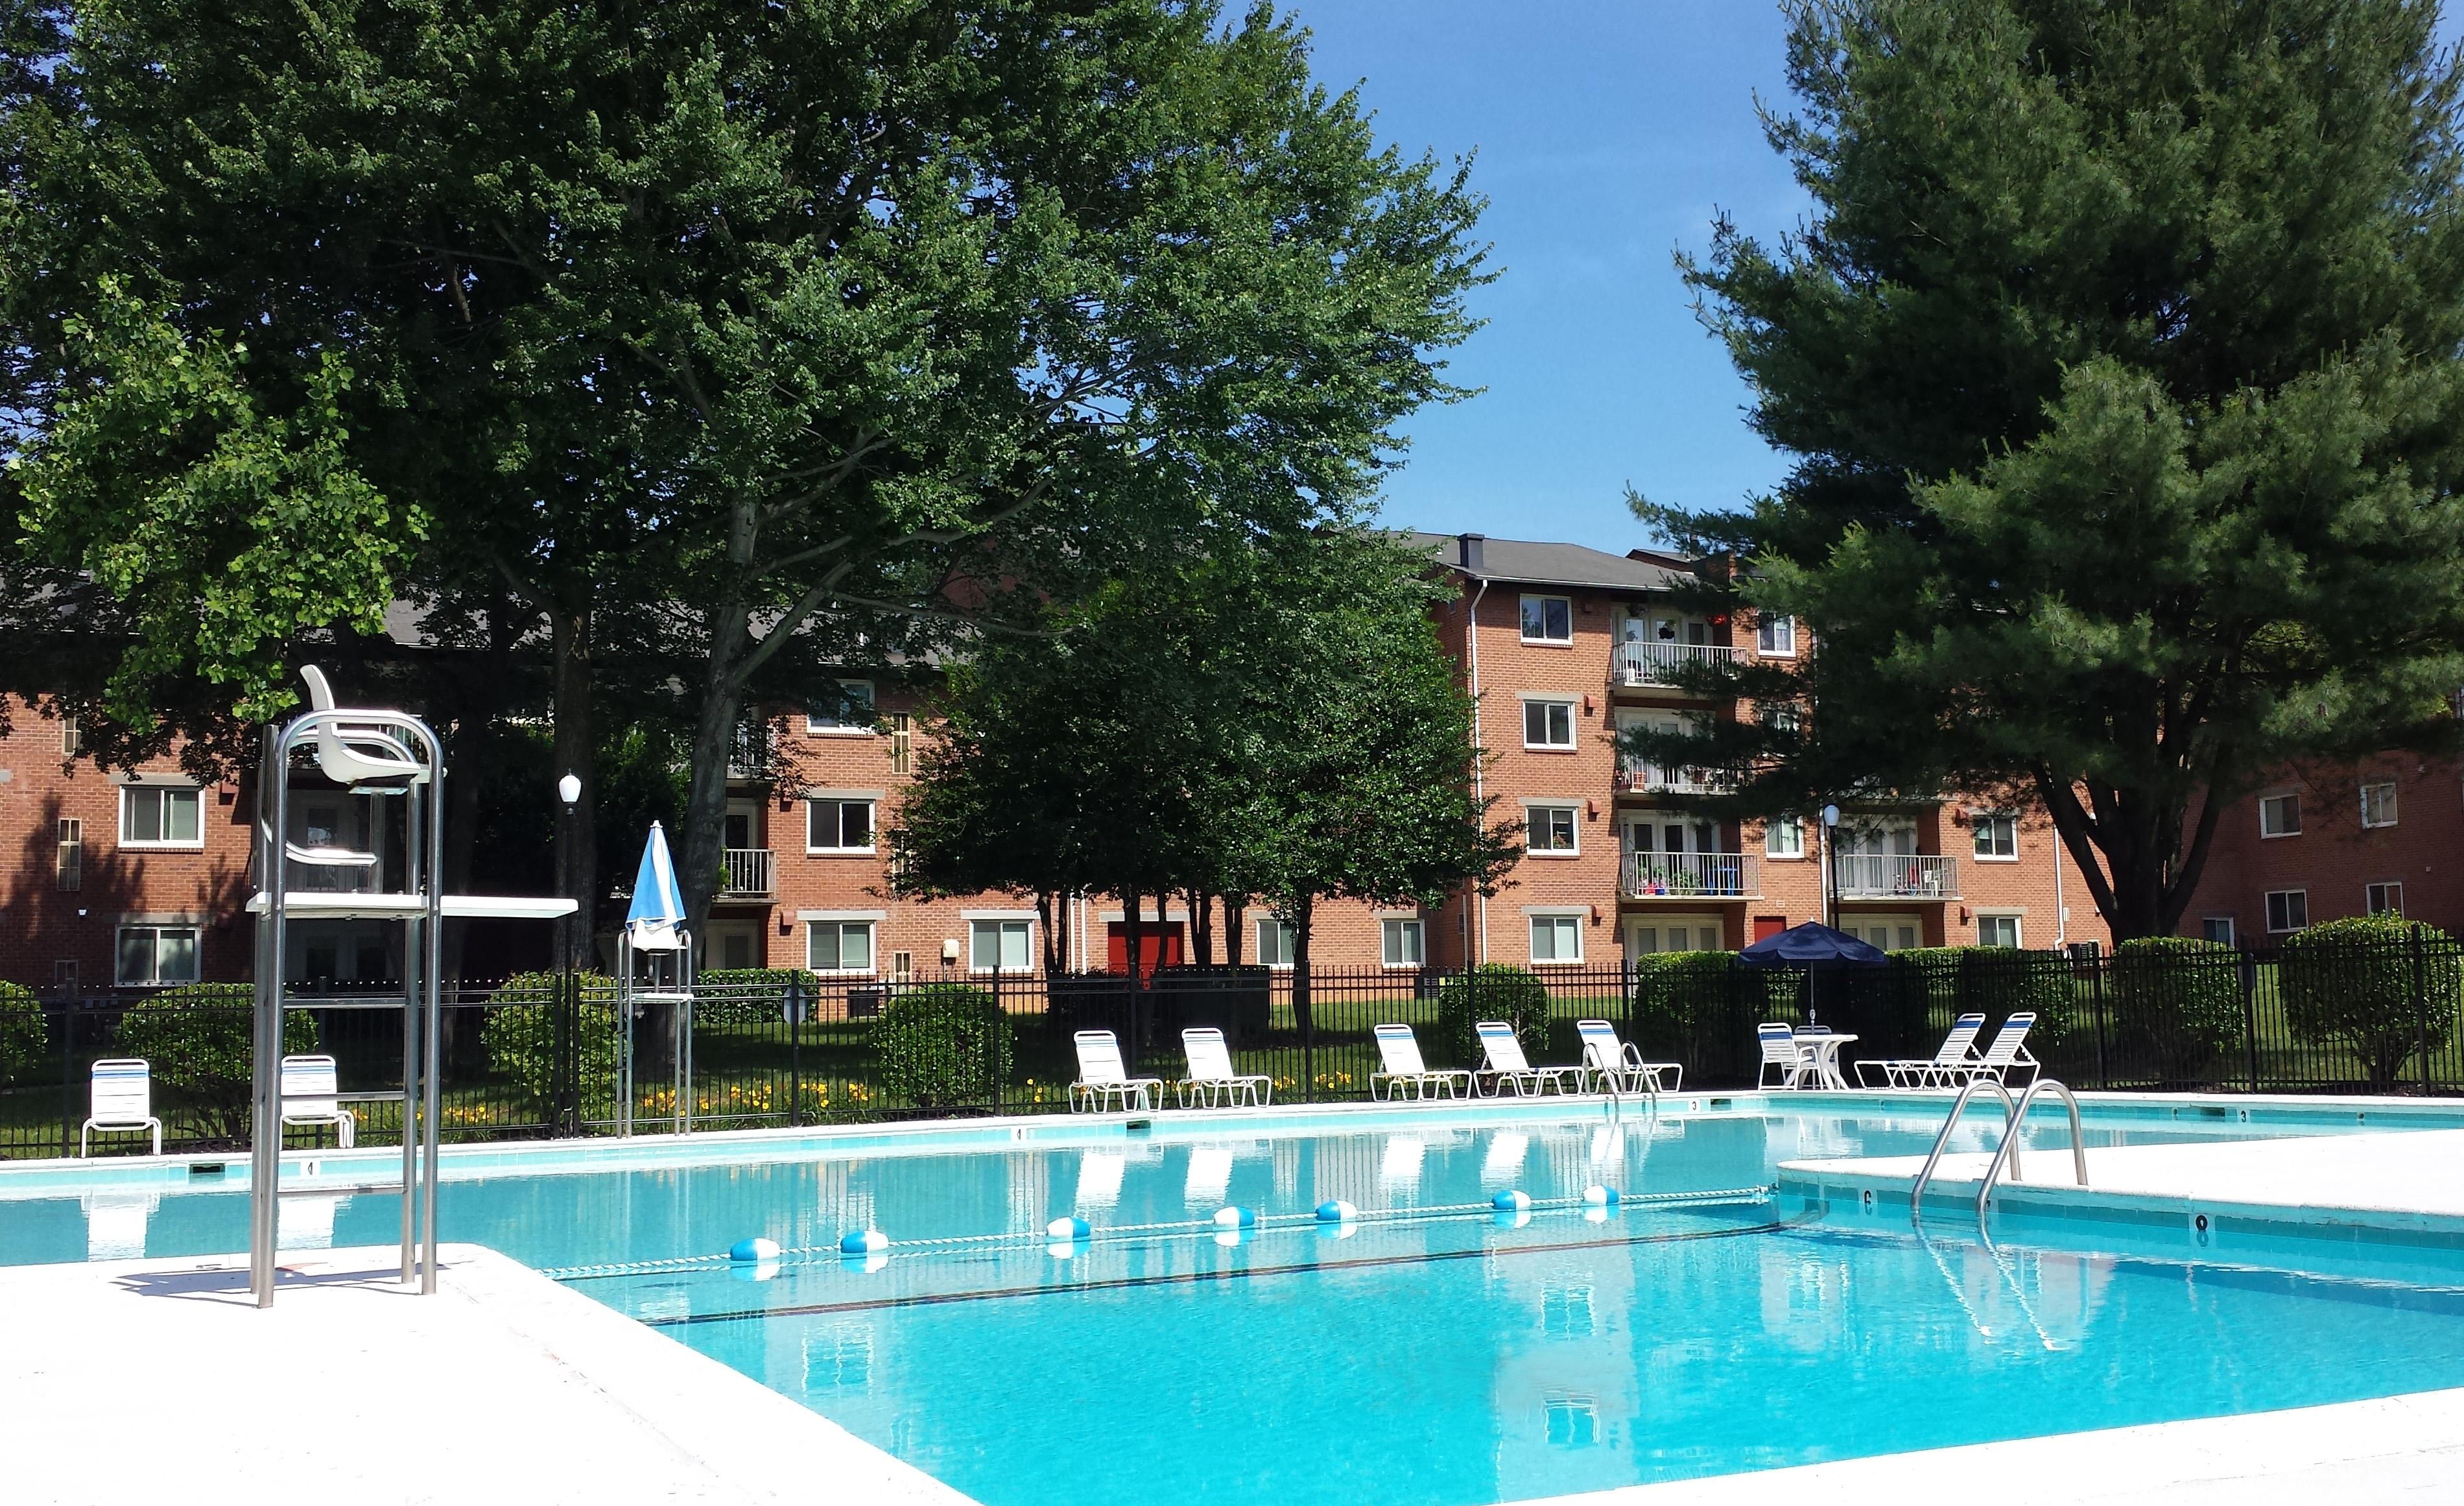 Fairfax Circle Villa Apartments Coupons Near Me In Fairfax 8coupons